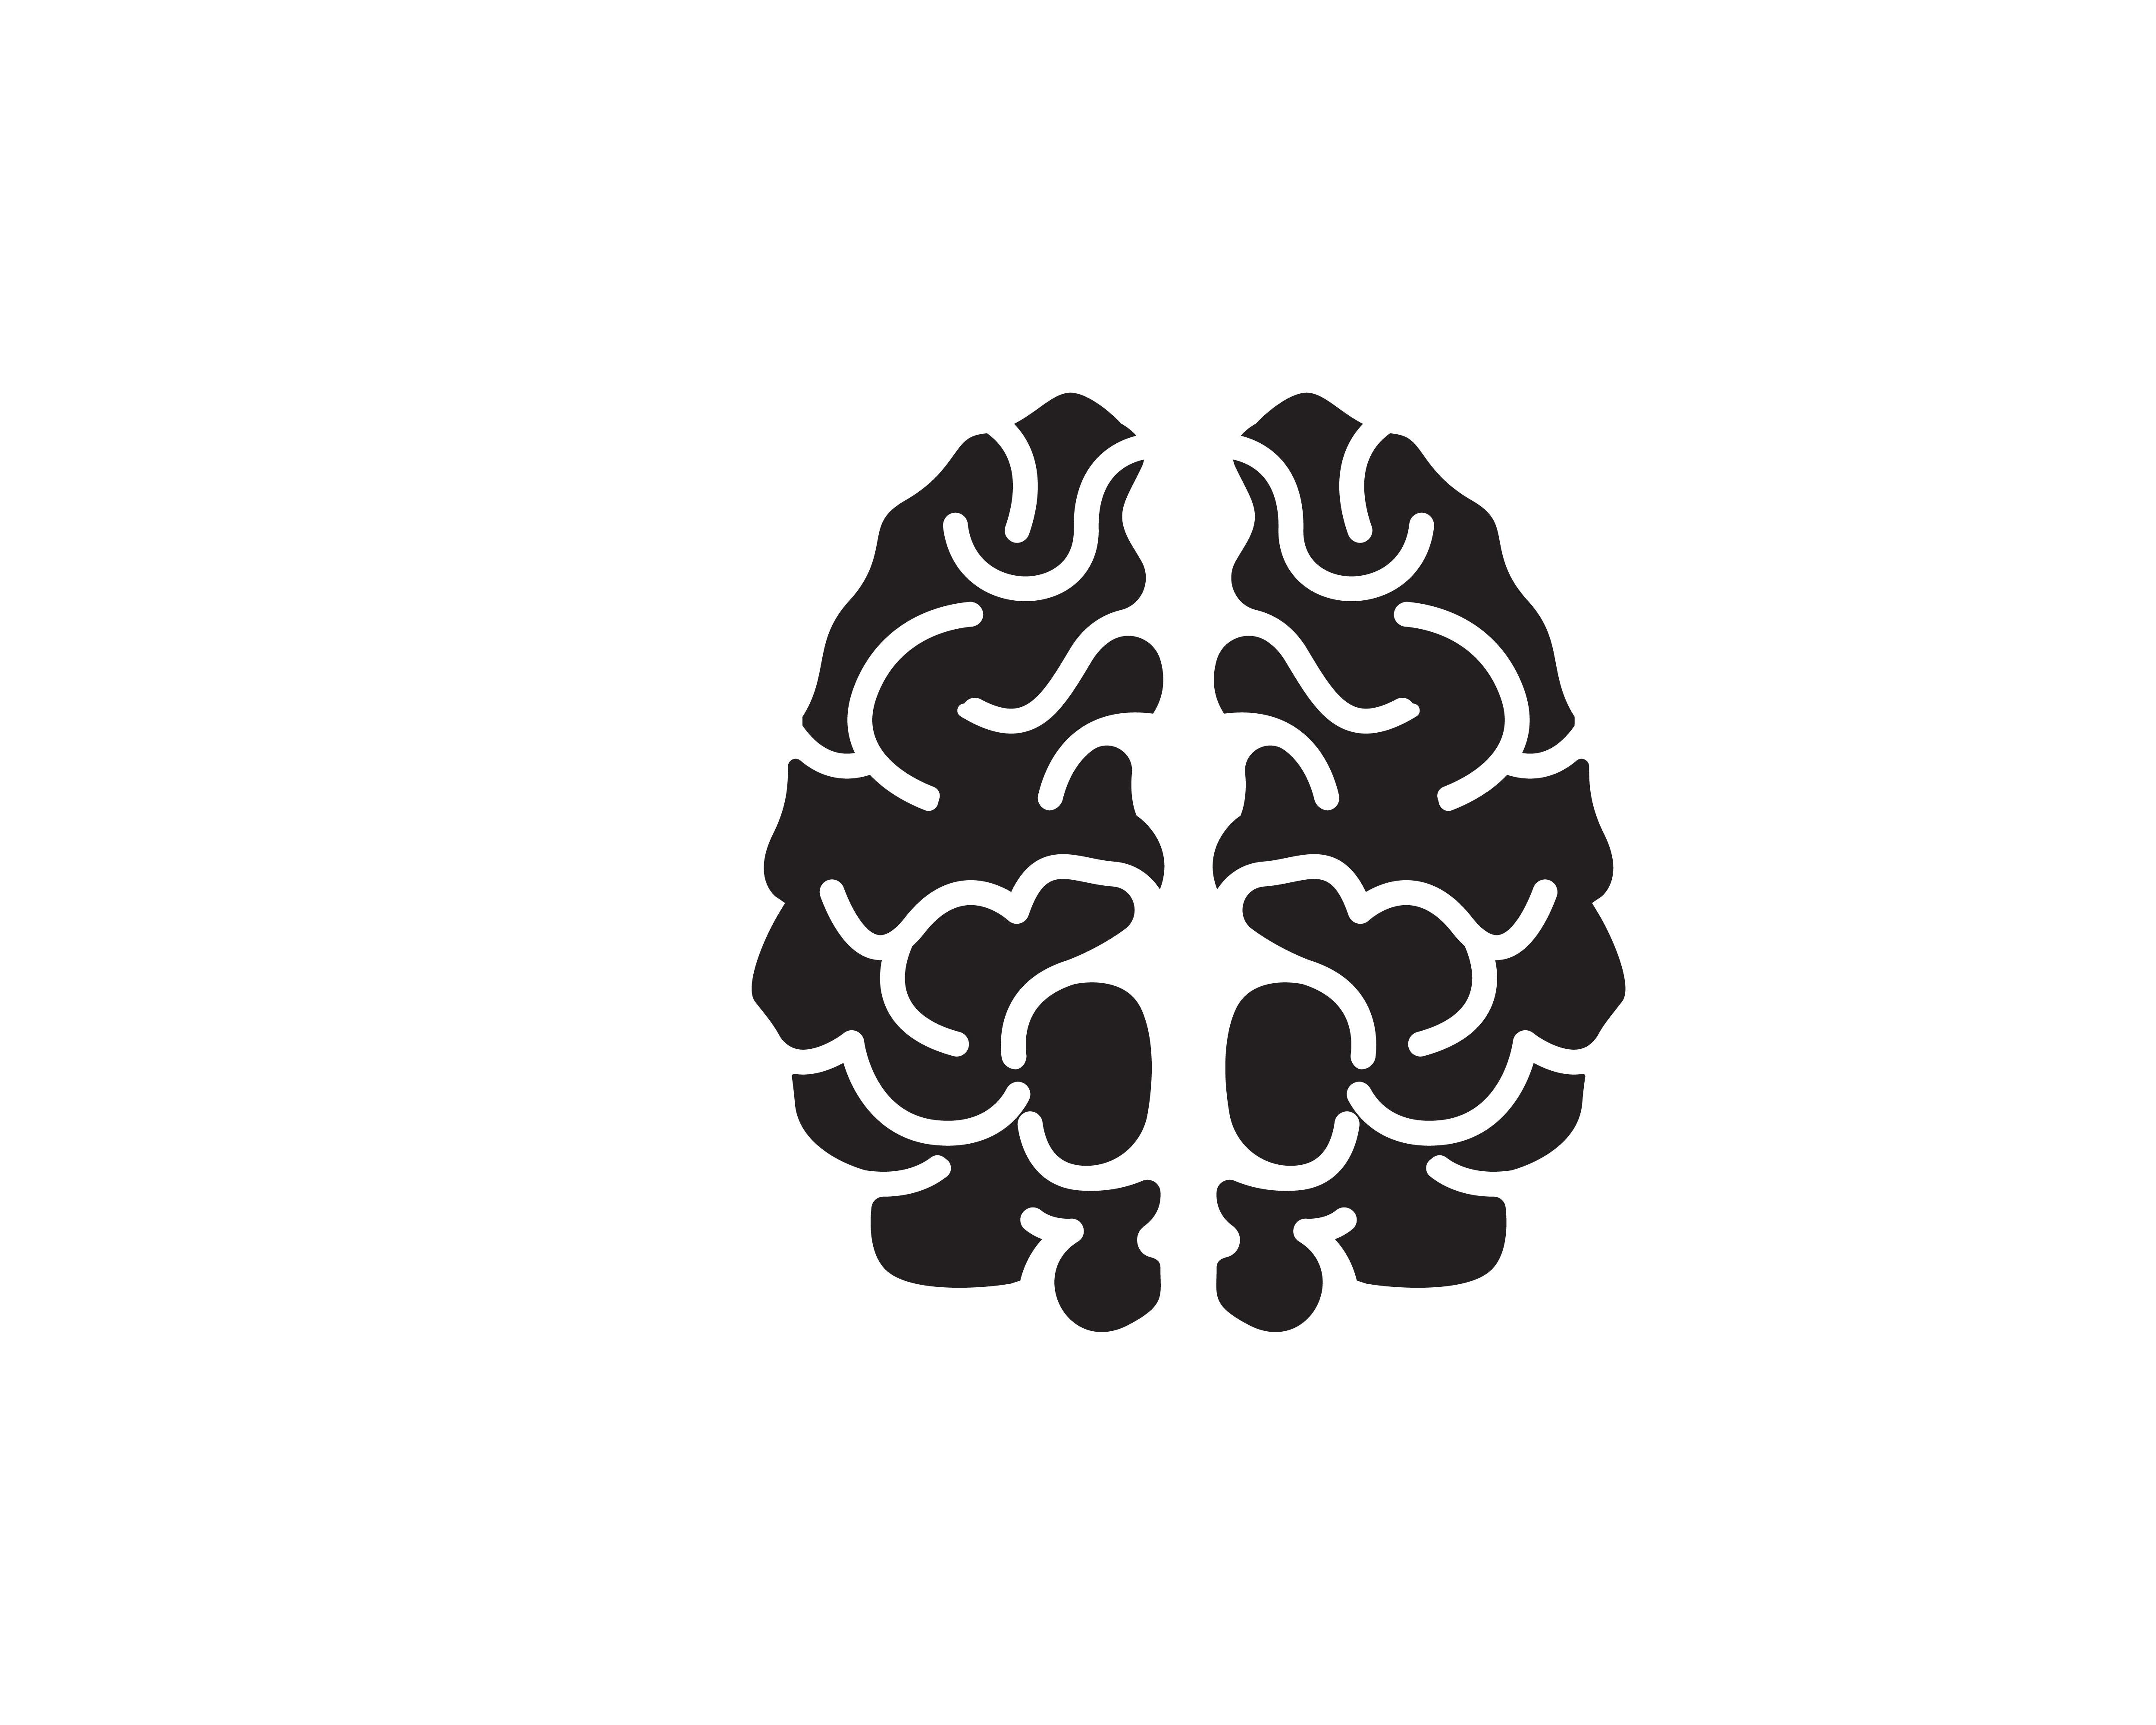 Free app logo vector art images